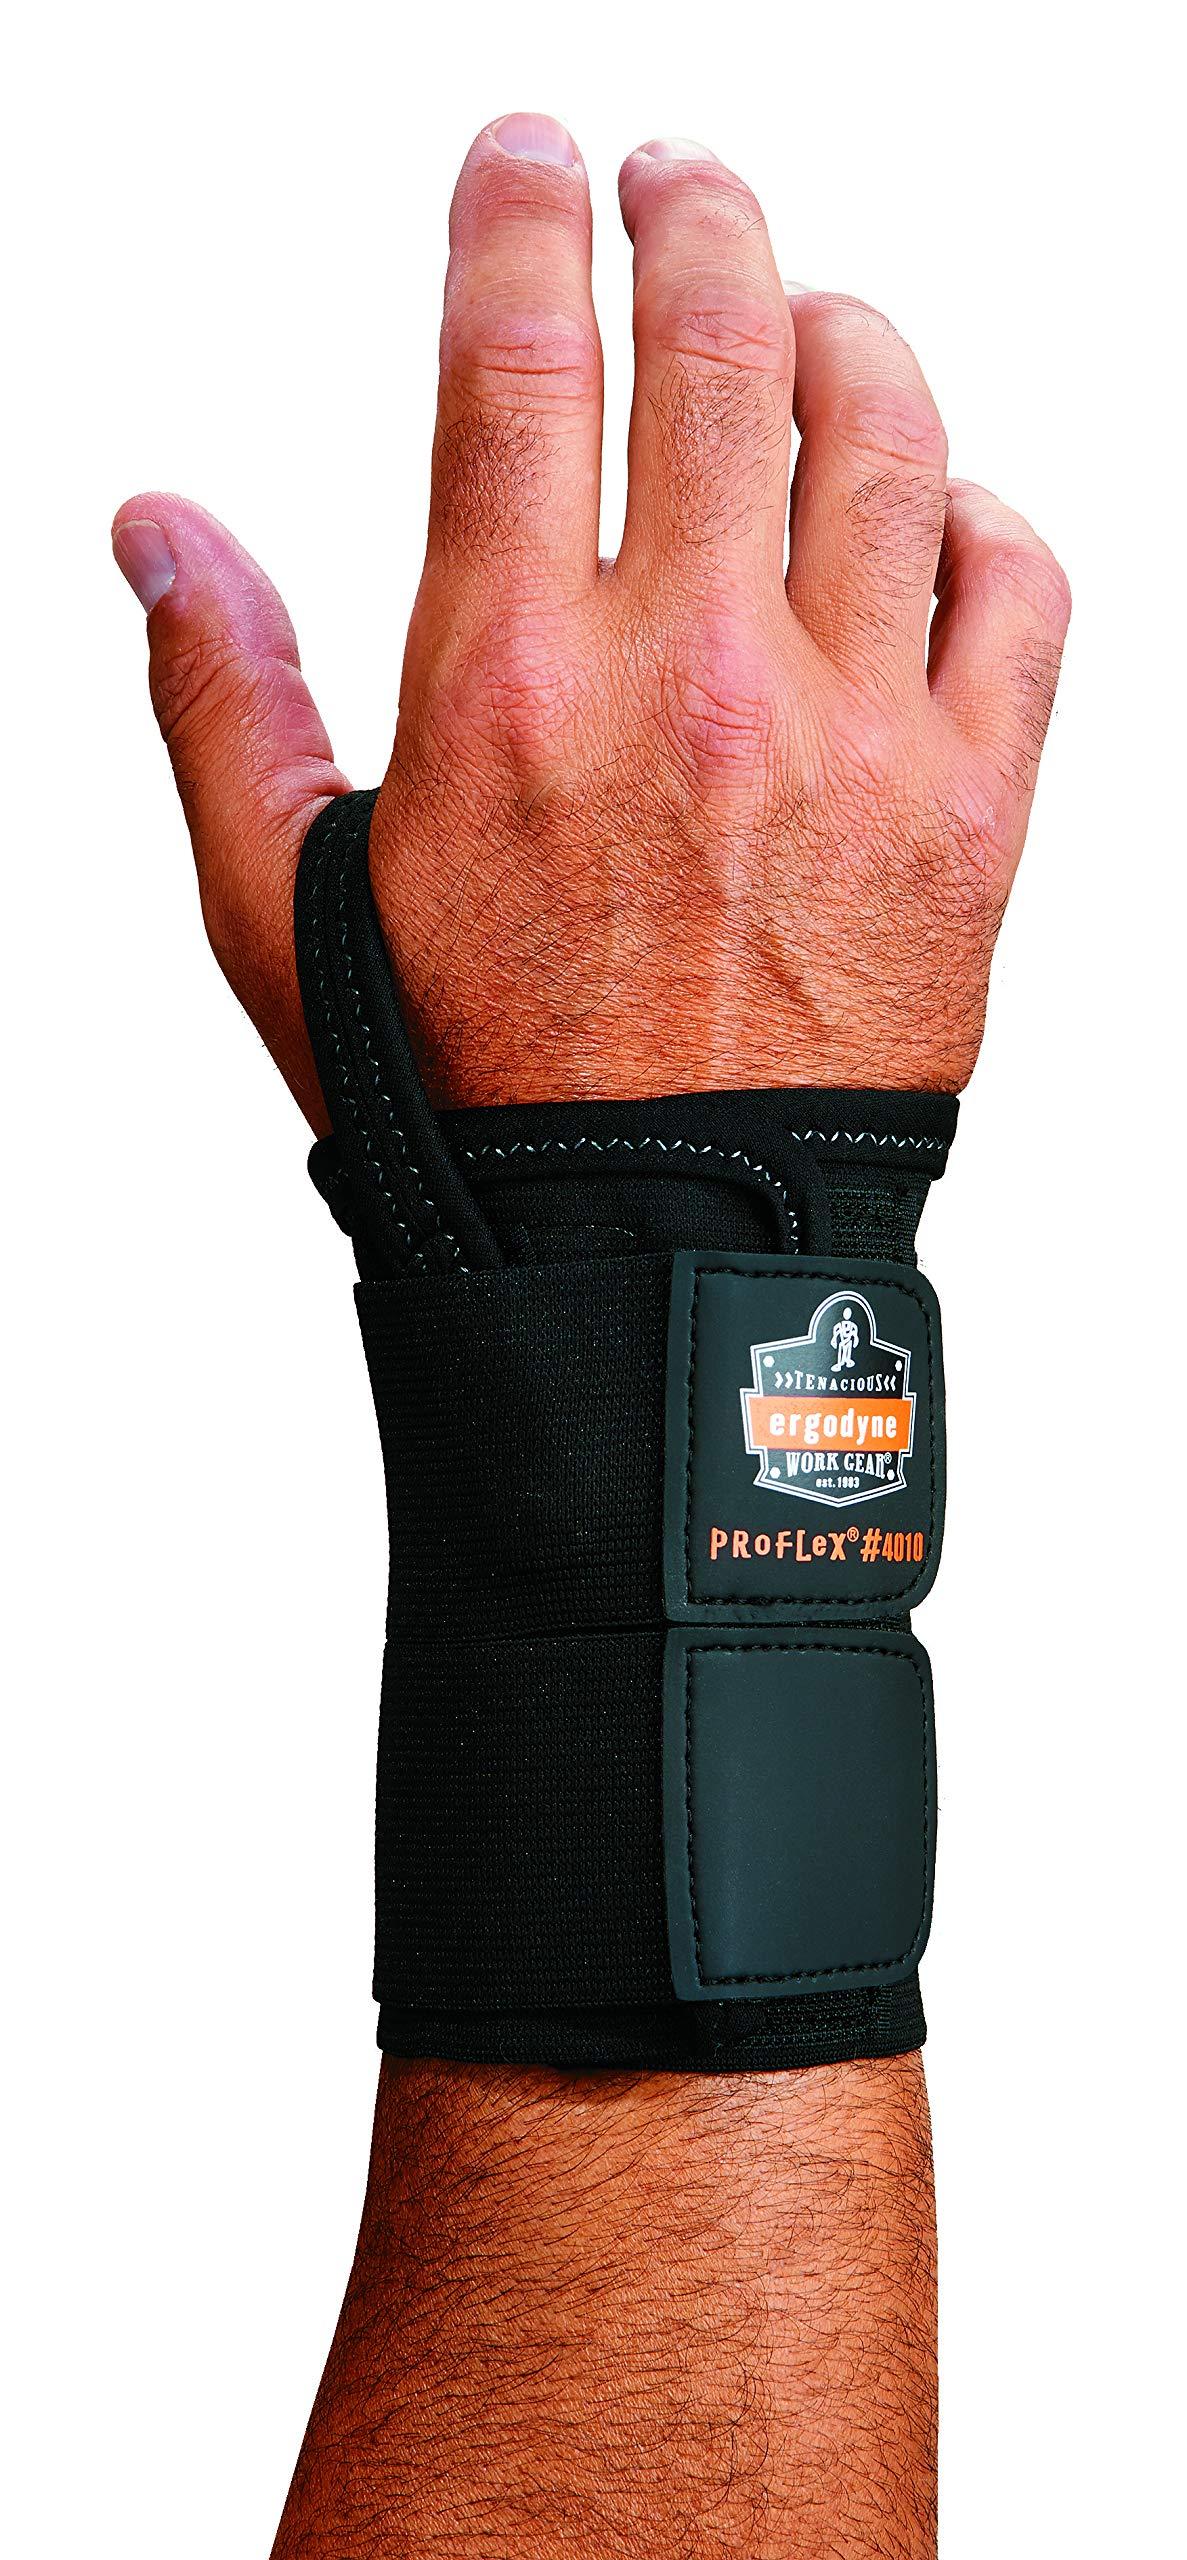 Ergodyne ProFlex 4010 Double-Strap Right Wrist Support, Black, Small